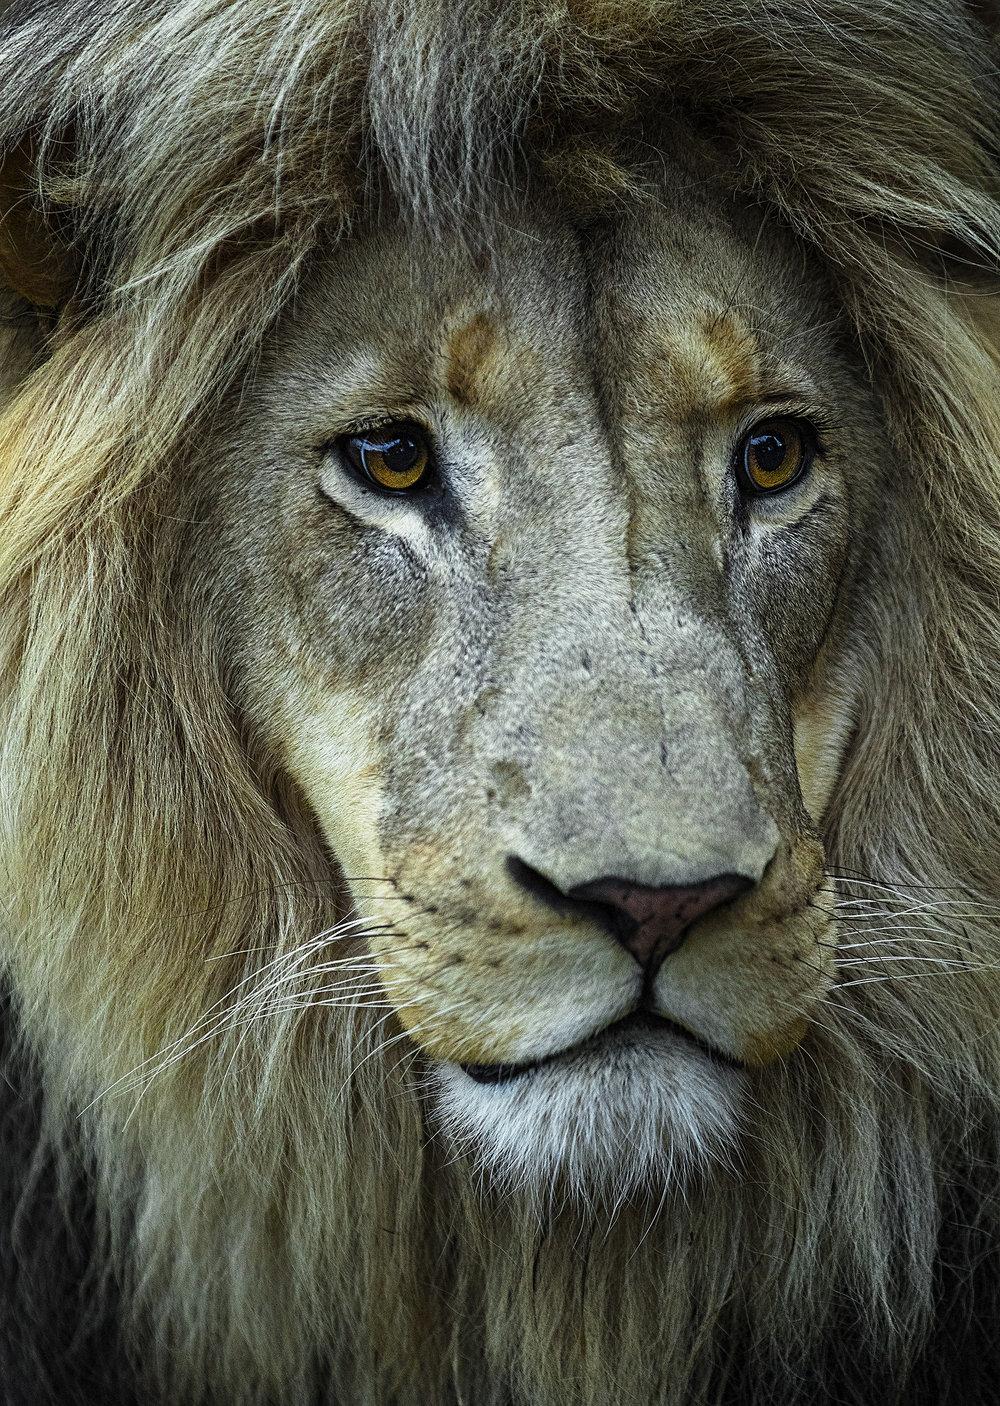 Simon+Needham+Humanitarian+Photography+Lions+of+Africa+20.jpg